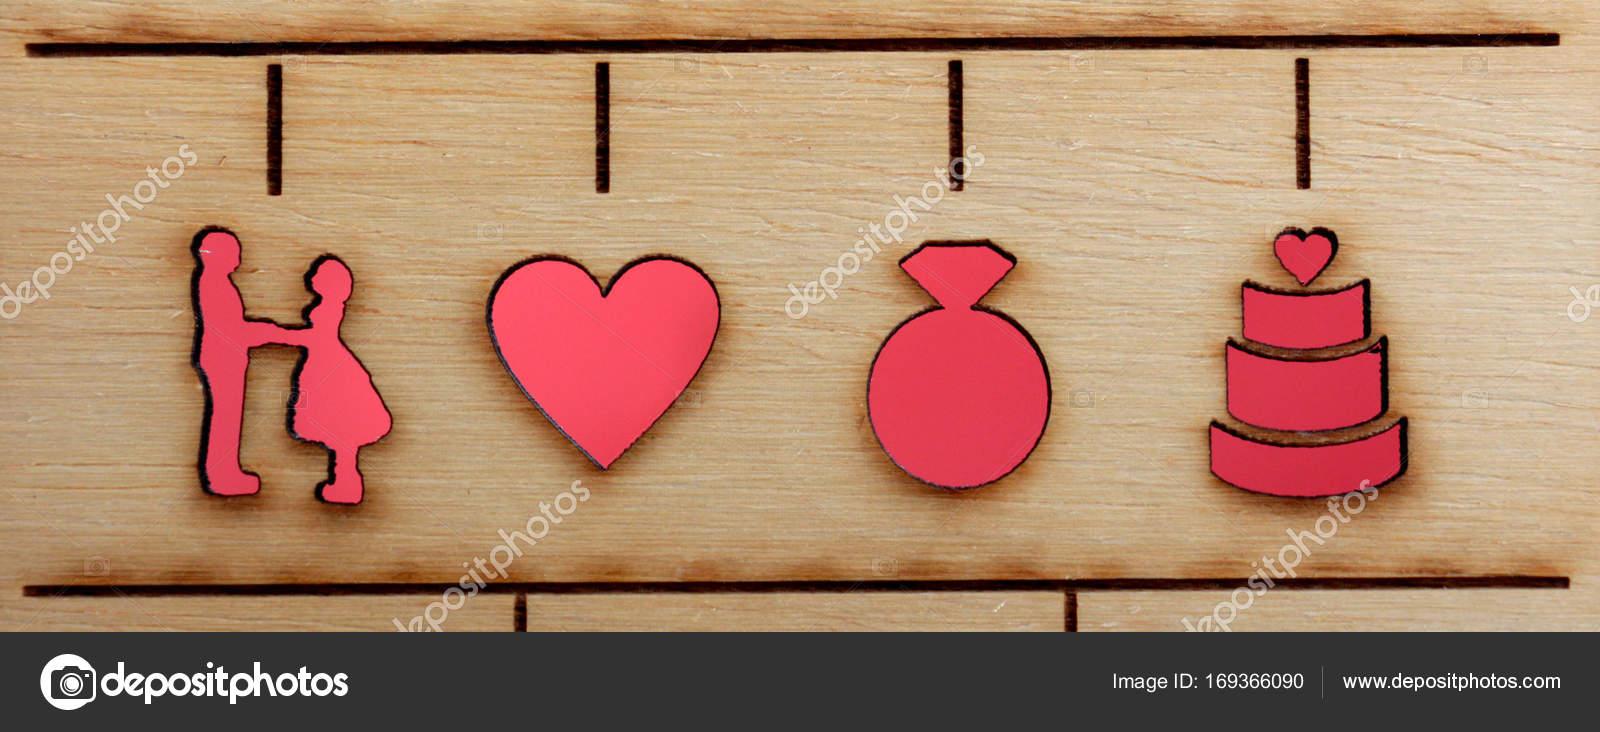 Laser engraved symbols of wedding bride groom heart ring and laser engraved symbols of wedding bride groom heart ring and cakeimage photo by nehruresen biocorpaavc Image collections